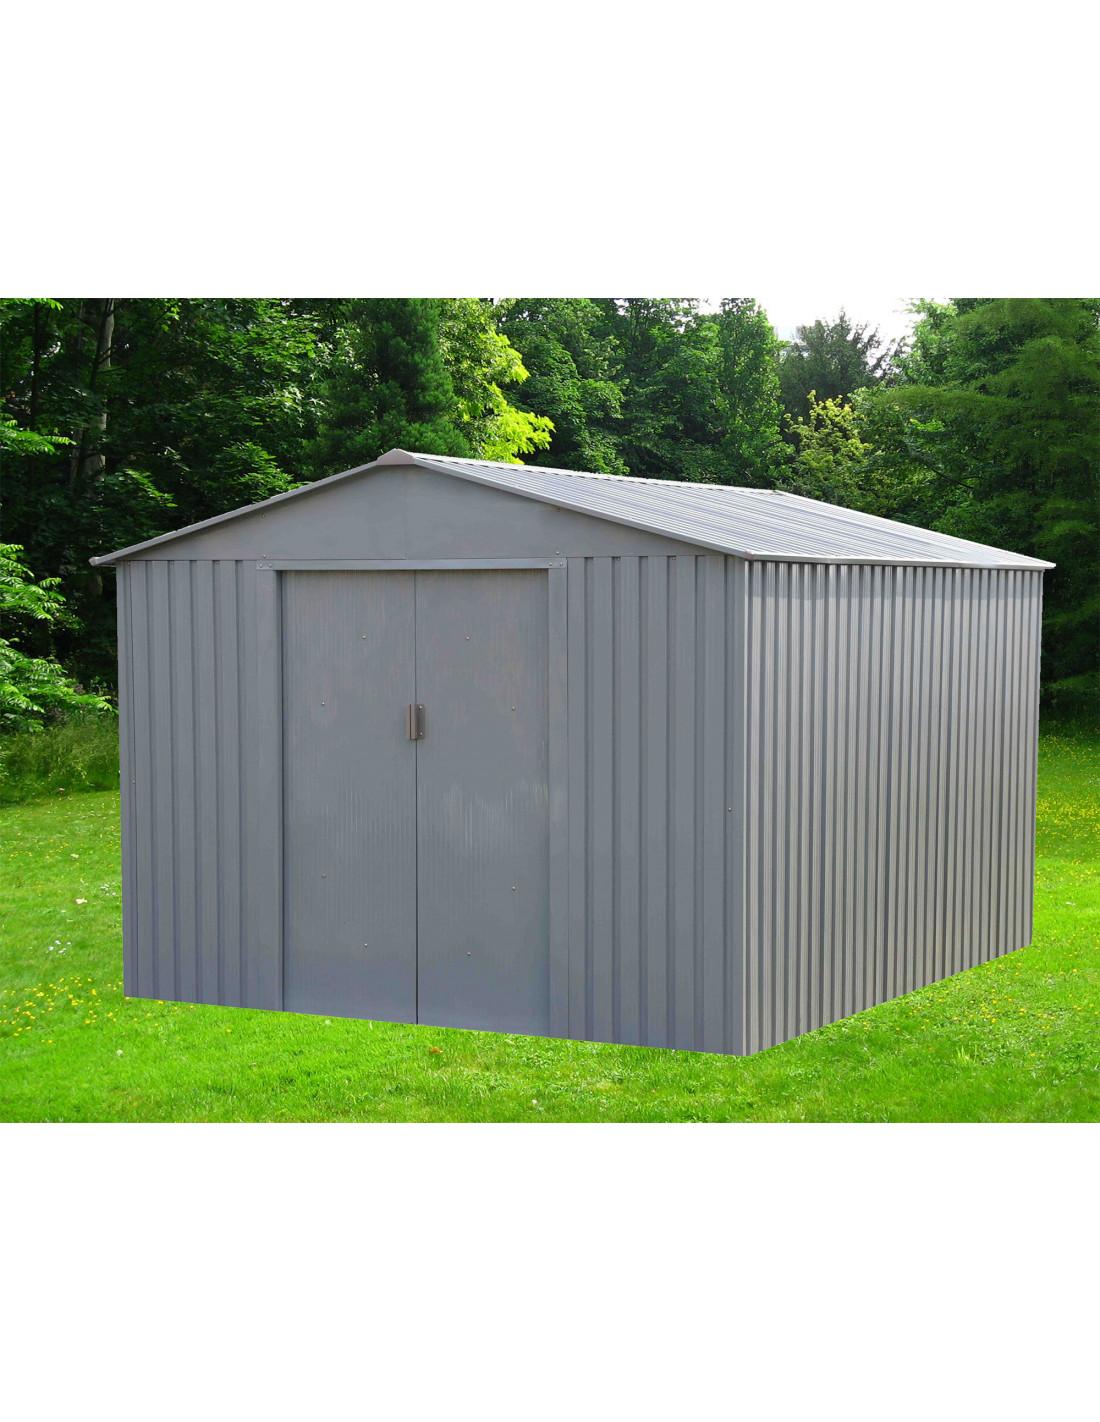 chalet jardin abri de jardin m tal mj 8x10 s1001e 7 86 m 261 x 301 x 198 cm hyper brico. Black Bedroom Furniture Sets. Home Design Ideas